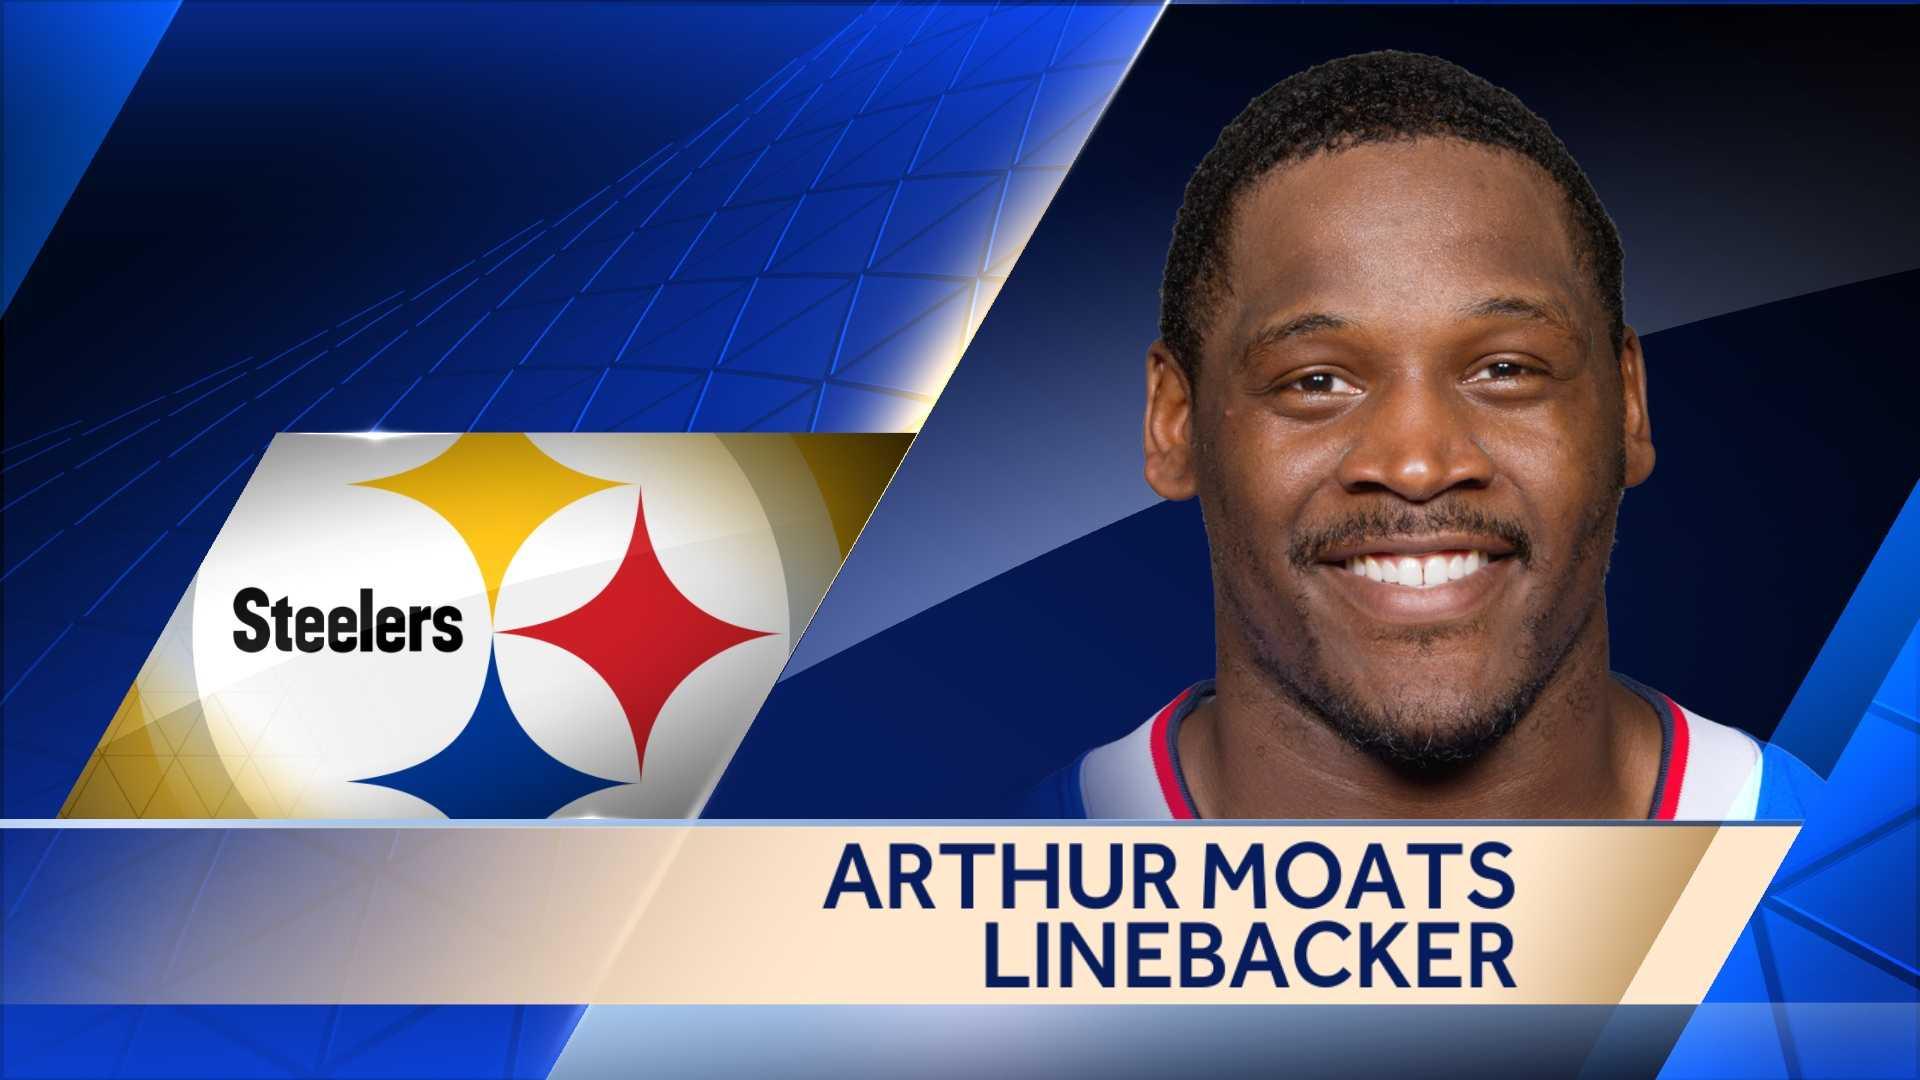 Arthur Moats